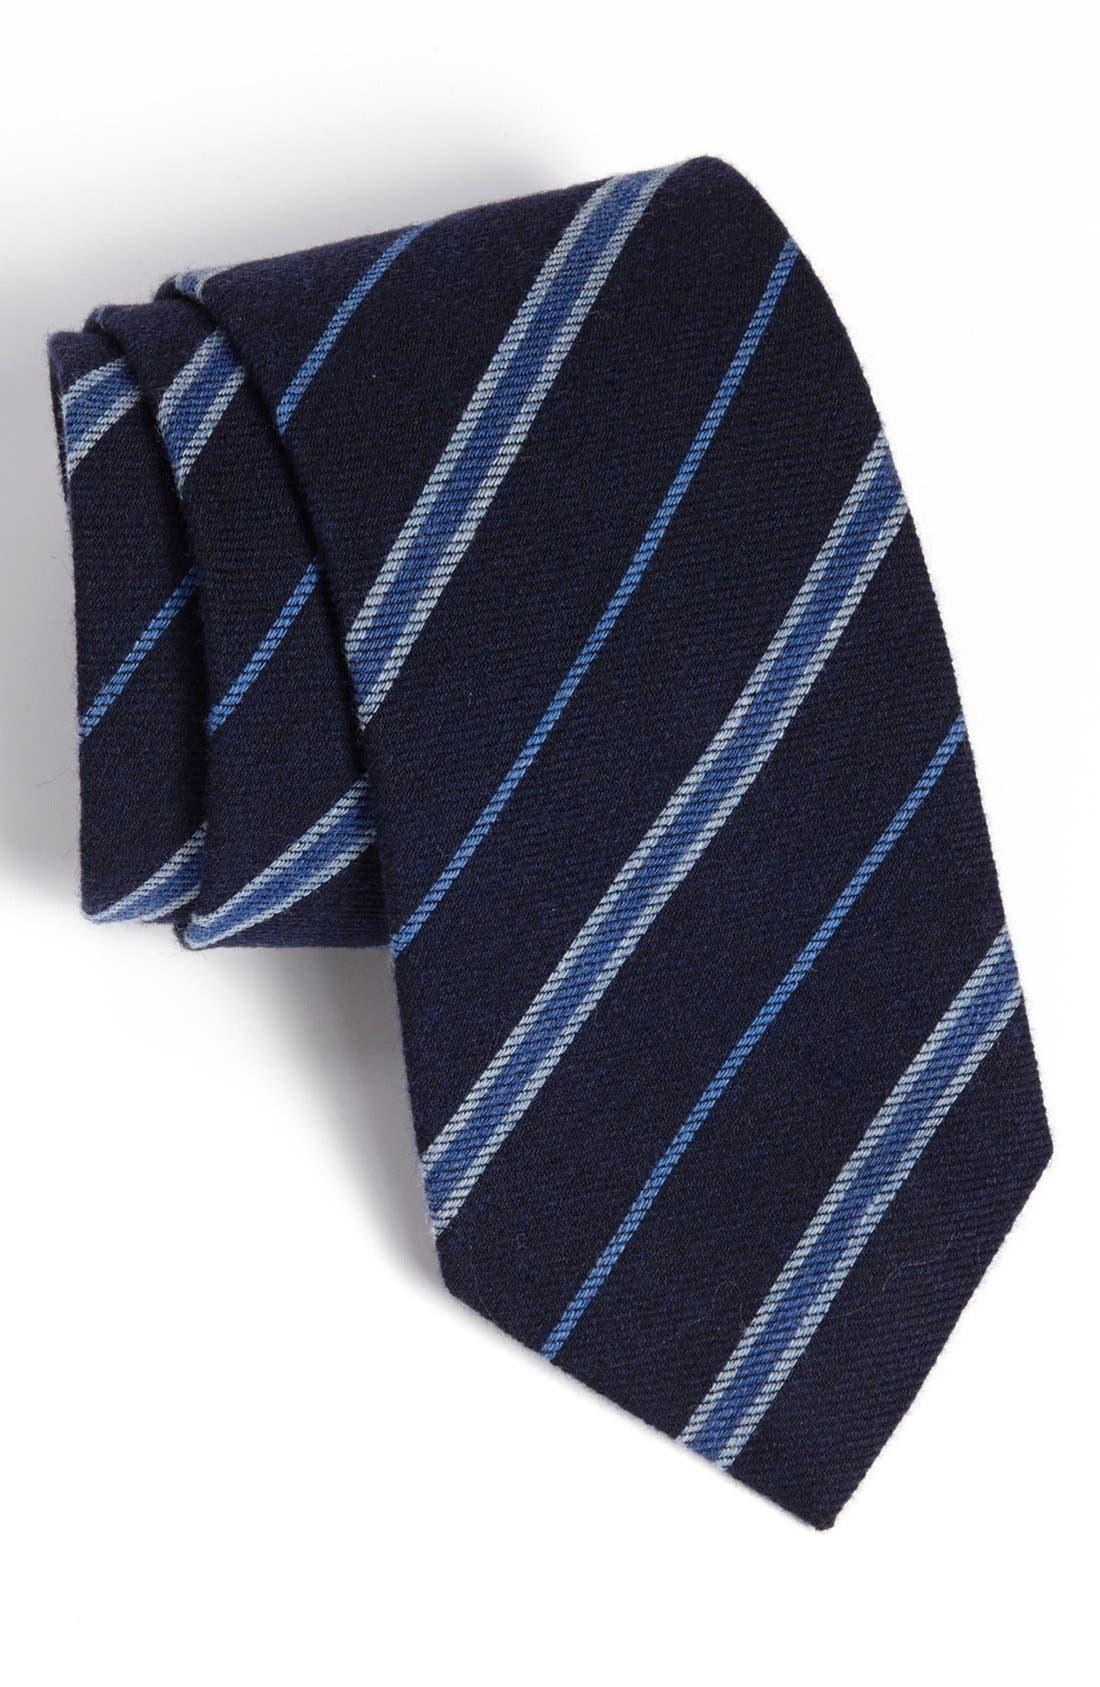 Alternate Image 1 Selected - John W. Nordstrom® Woven Wool Tie